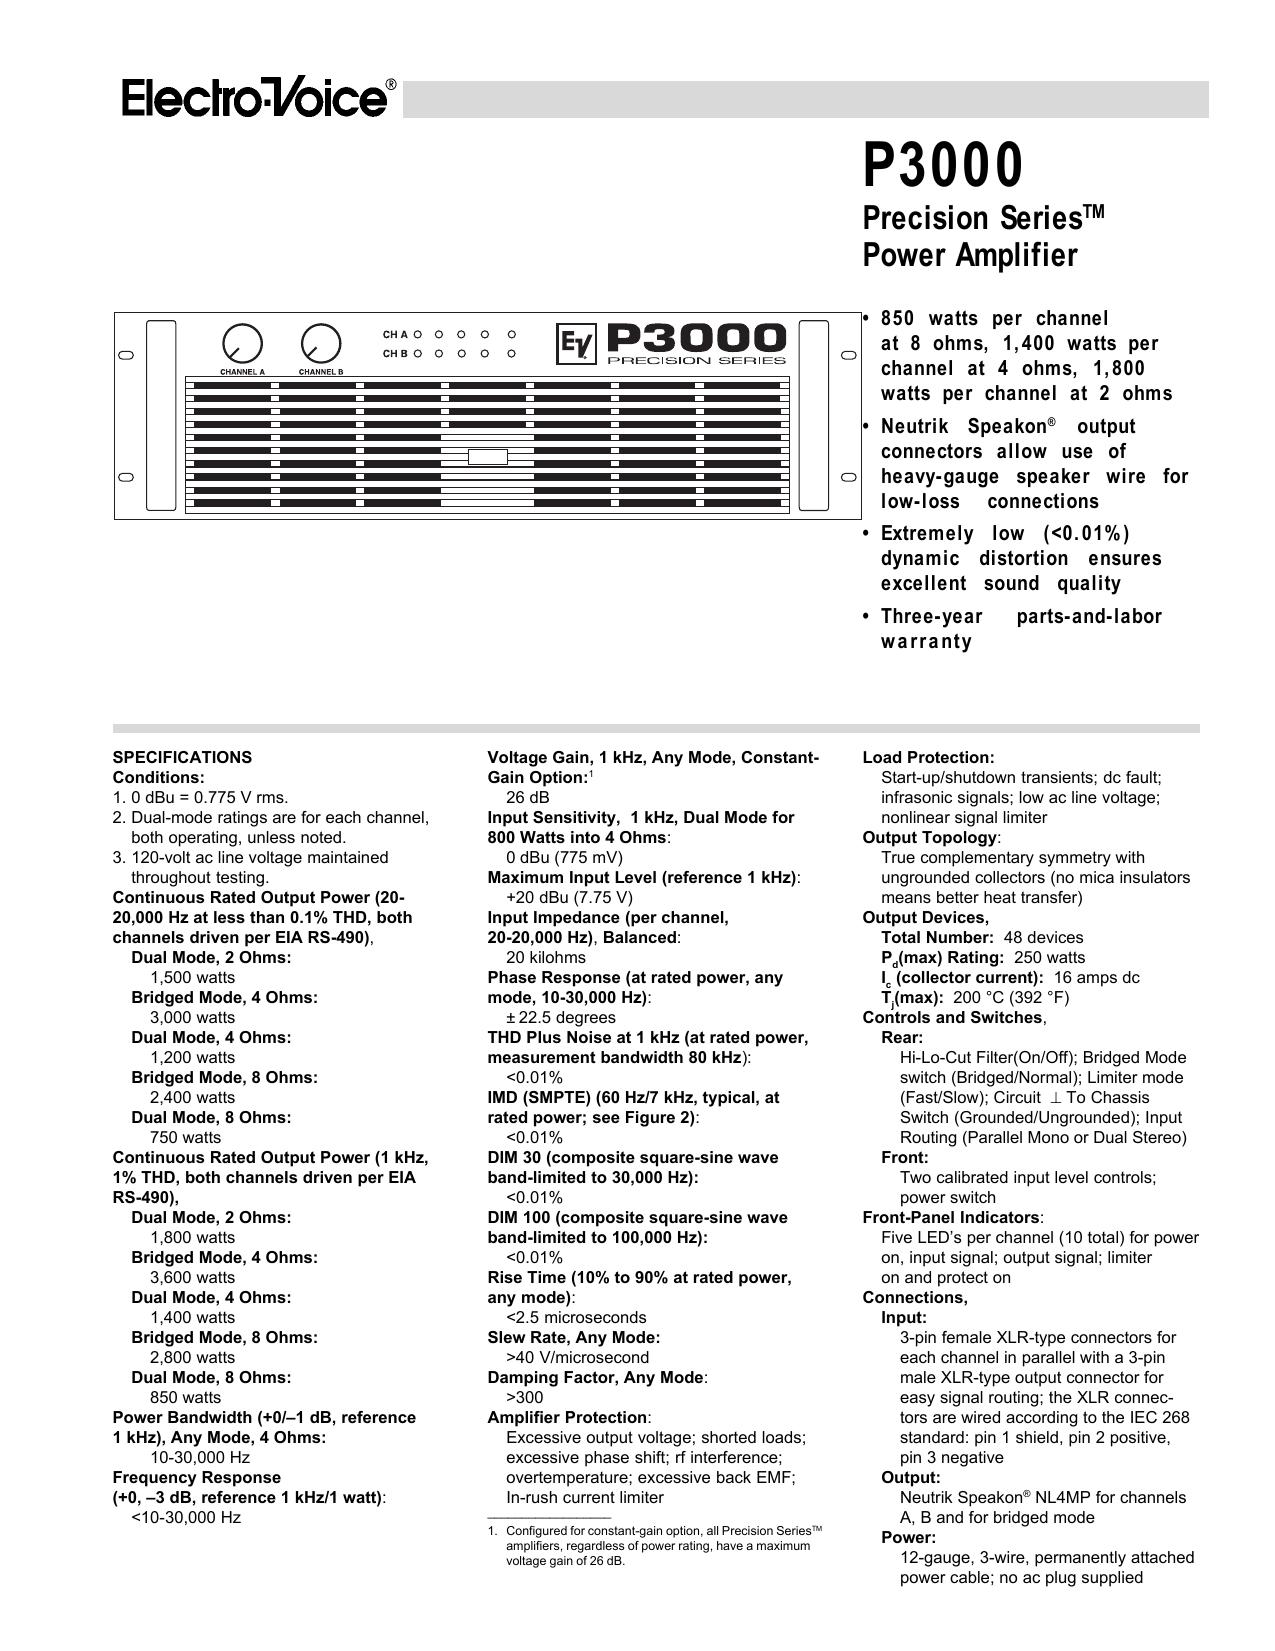 Wiring Diagram Also Speakon Connector Wiring Diagram Further 1995